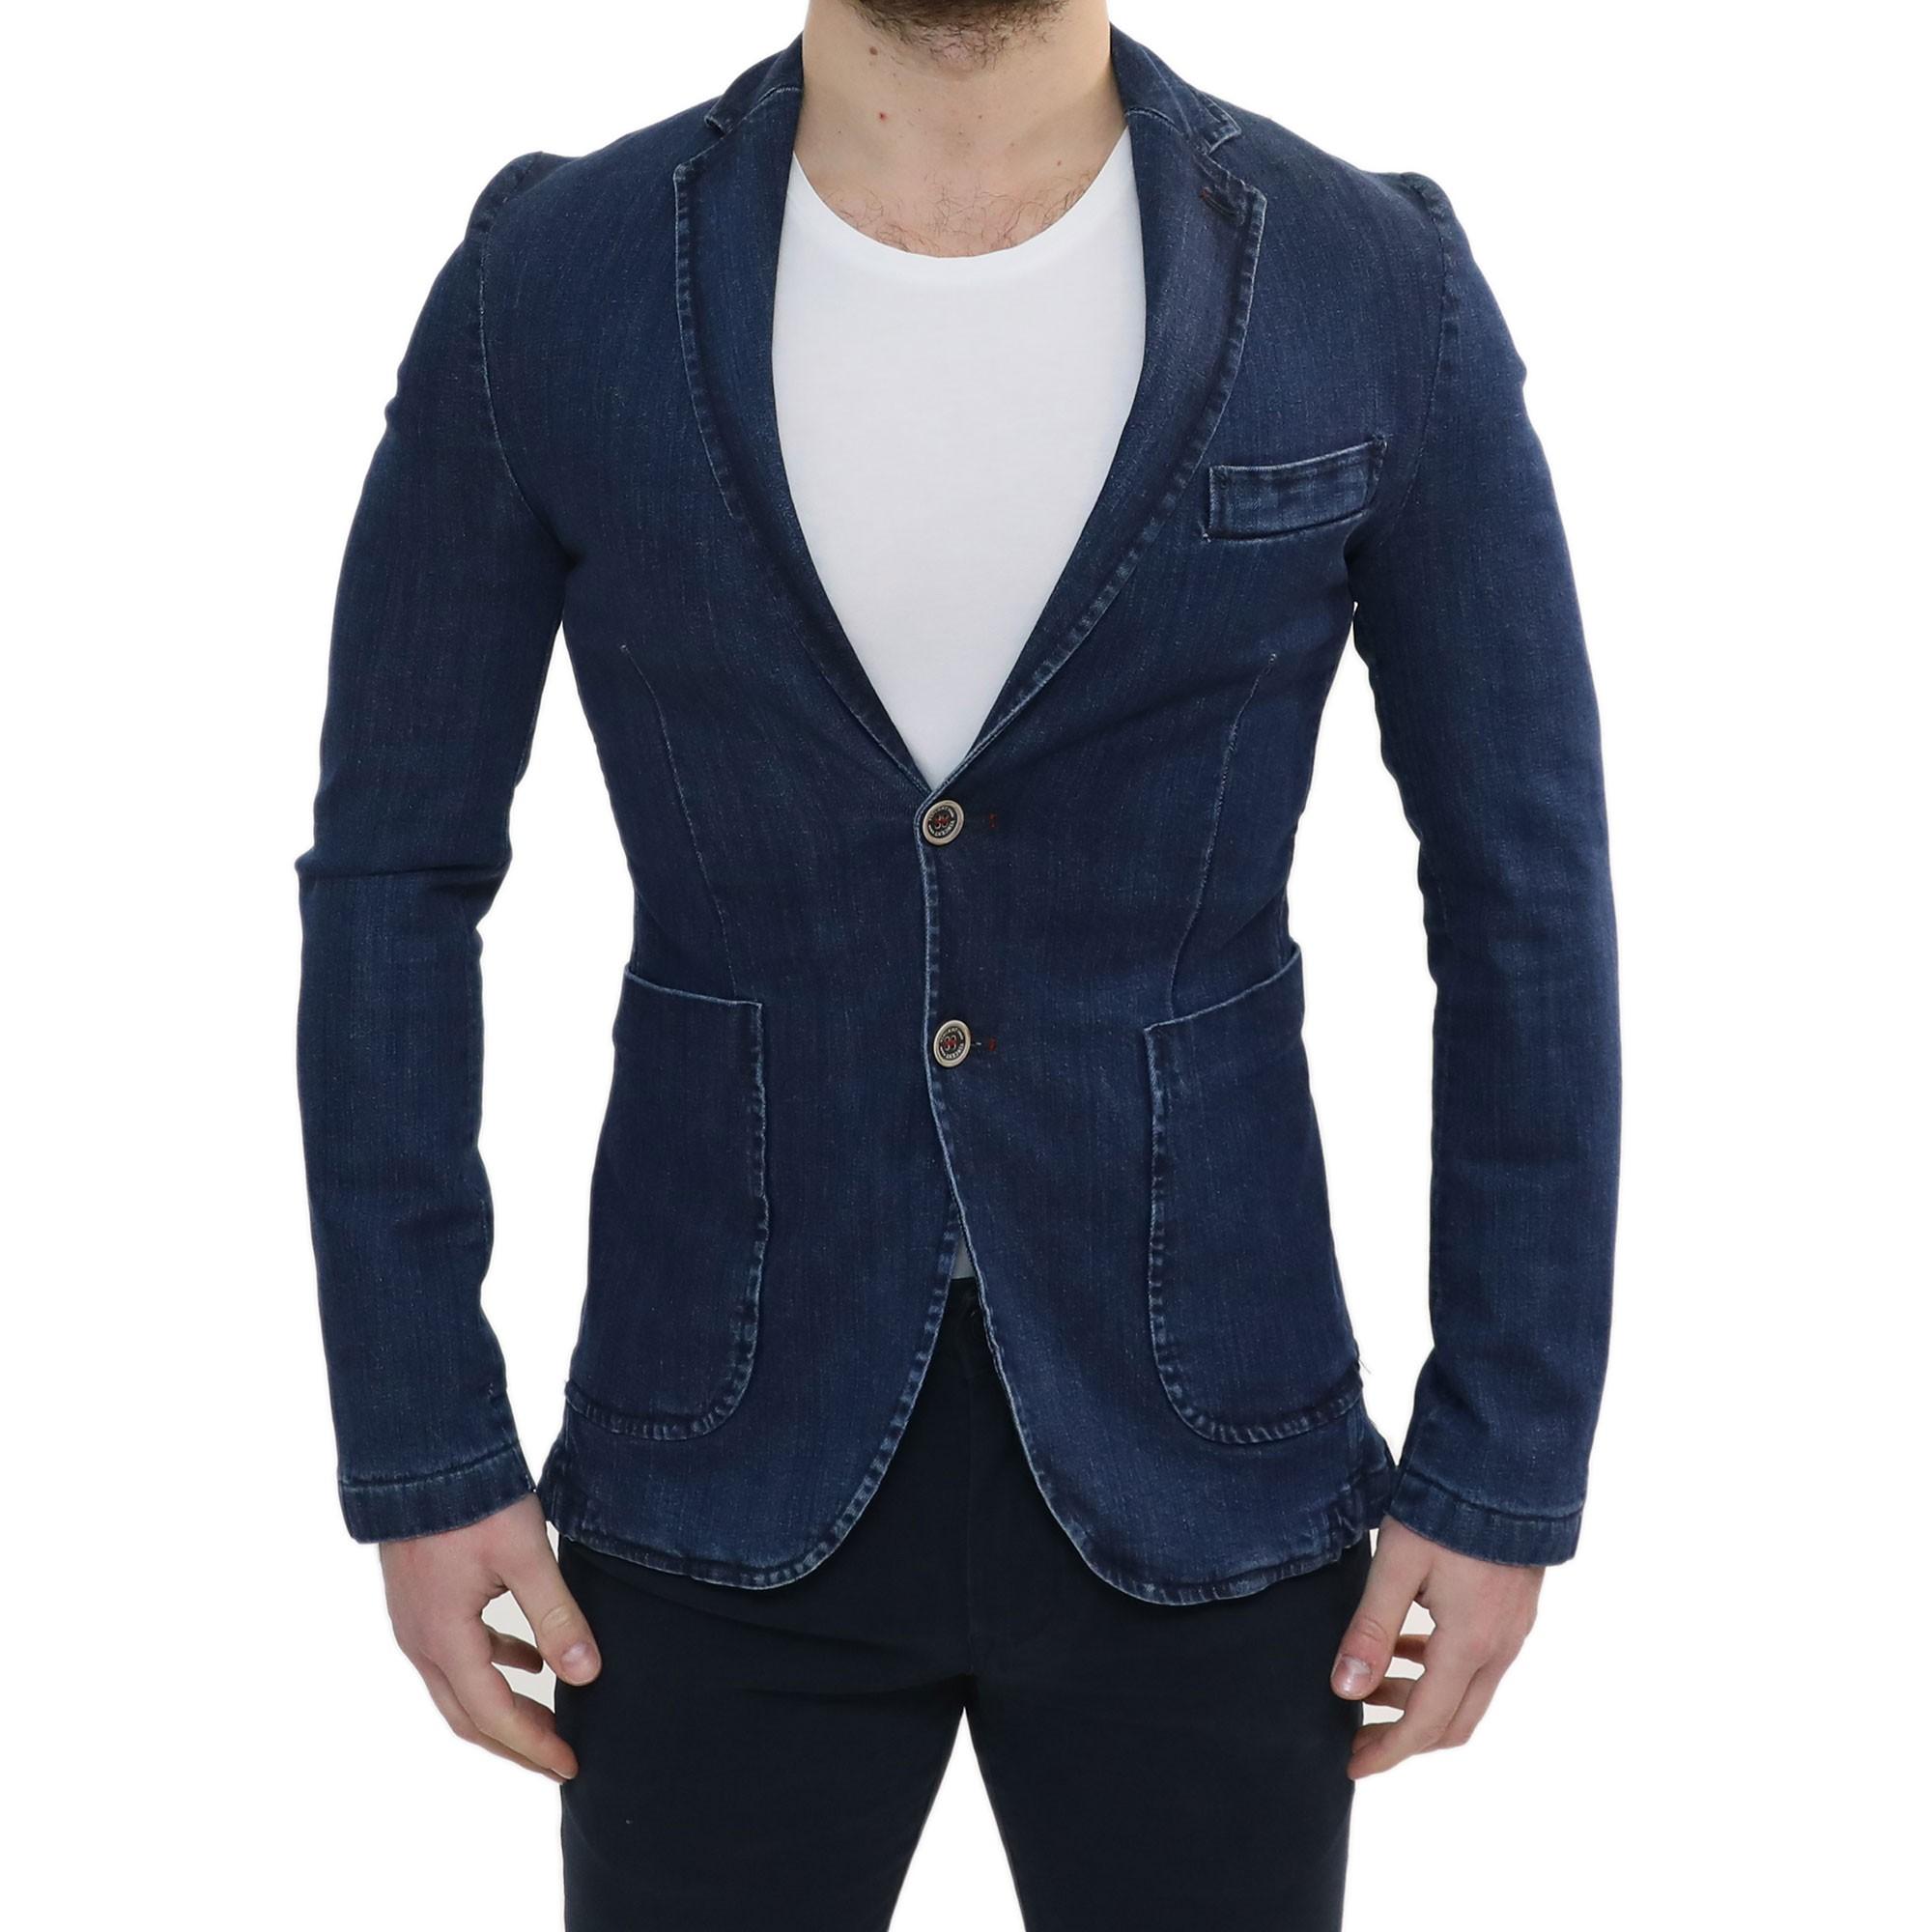 Giacca Blazer Uomo Slim Fit Blu Denim Vincent Elegante Casual Sartoriale